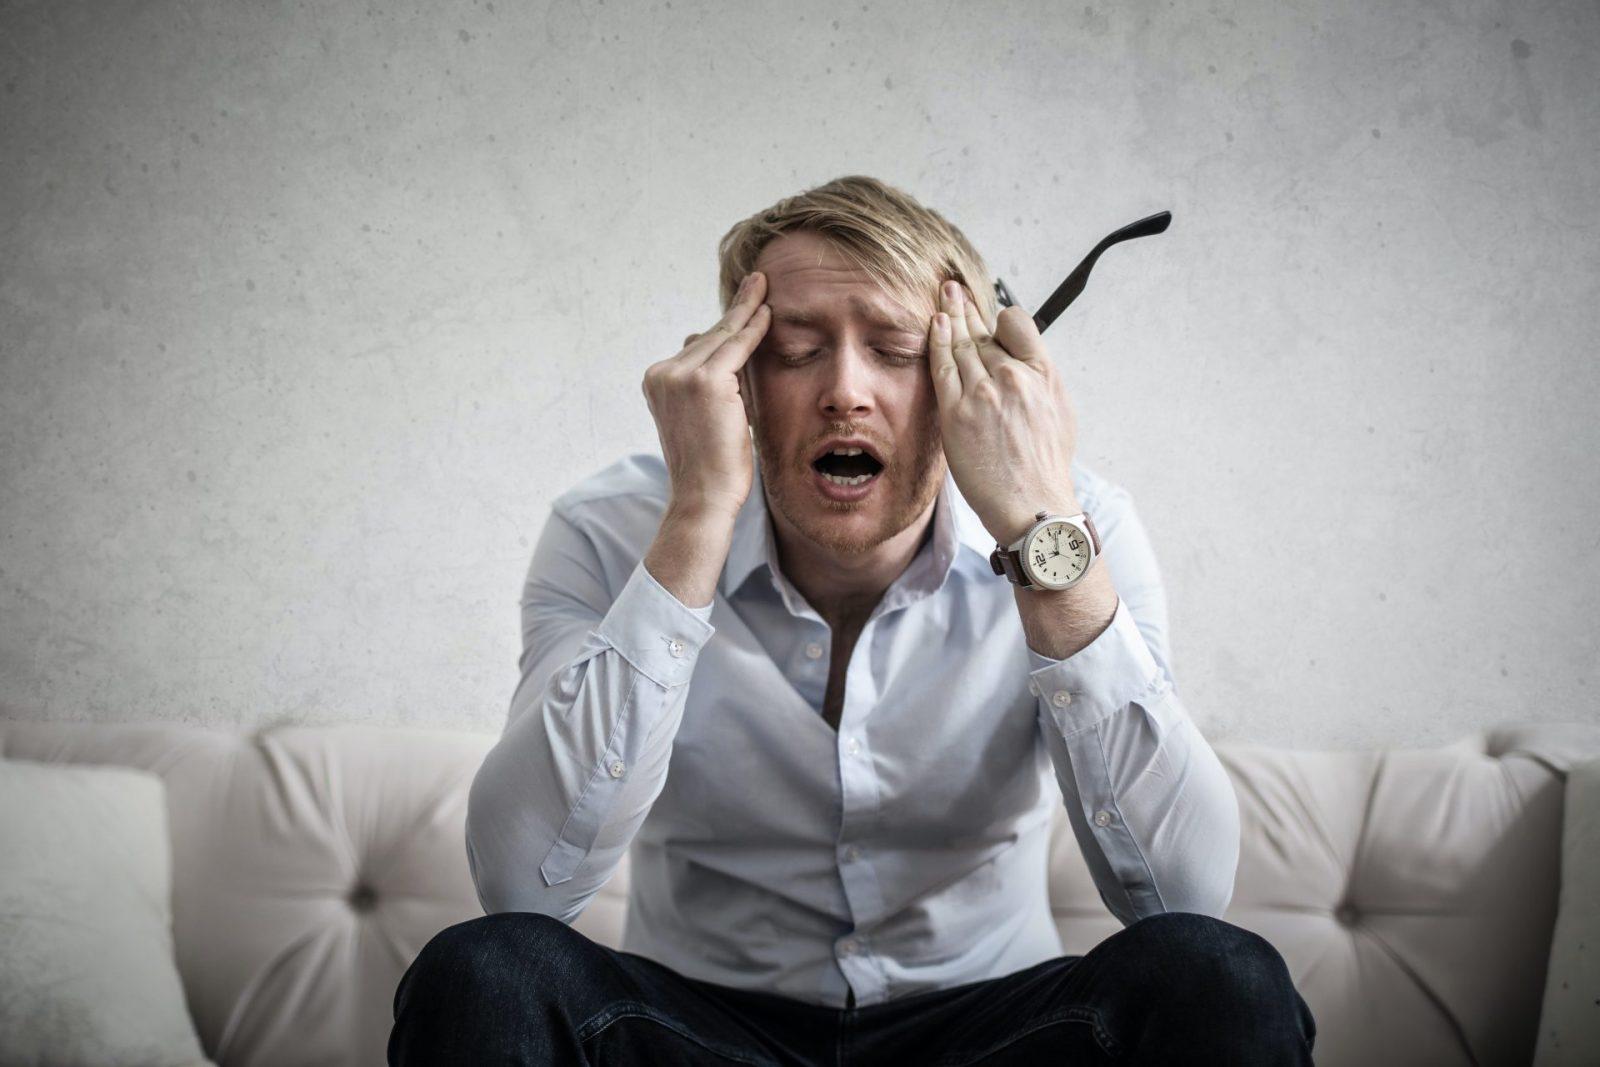 The dangers of chronic stress